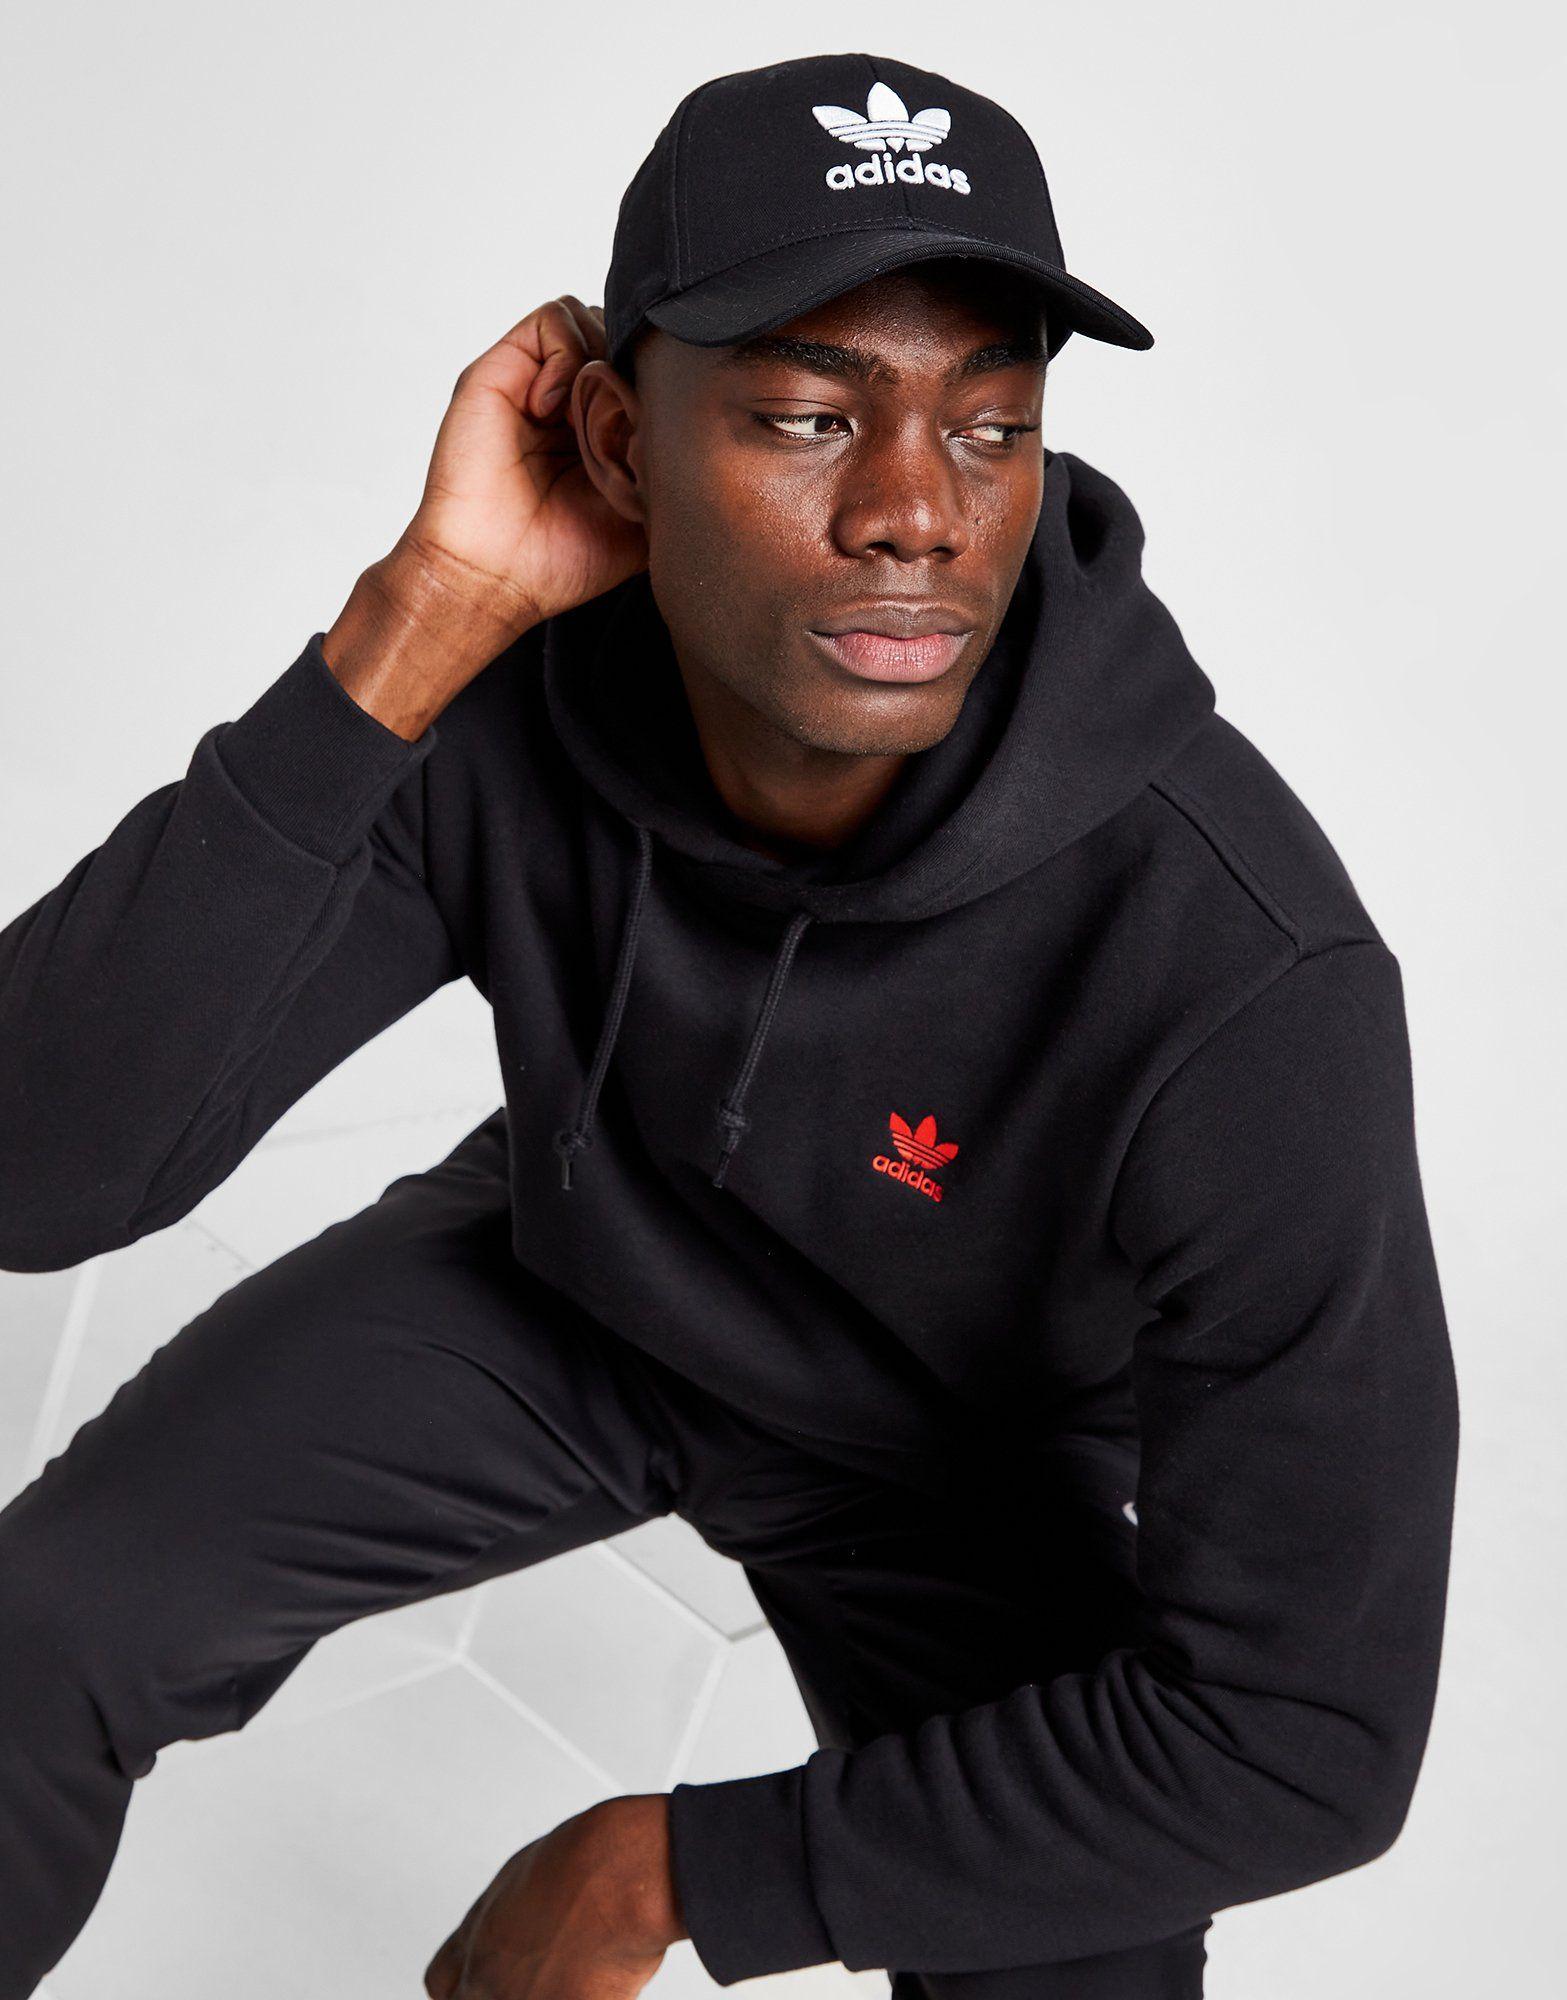 c2cfbbfbe09a1 adidas Originals Classic Trefoil Cap | JD Sports